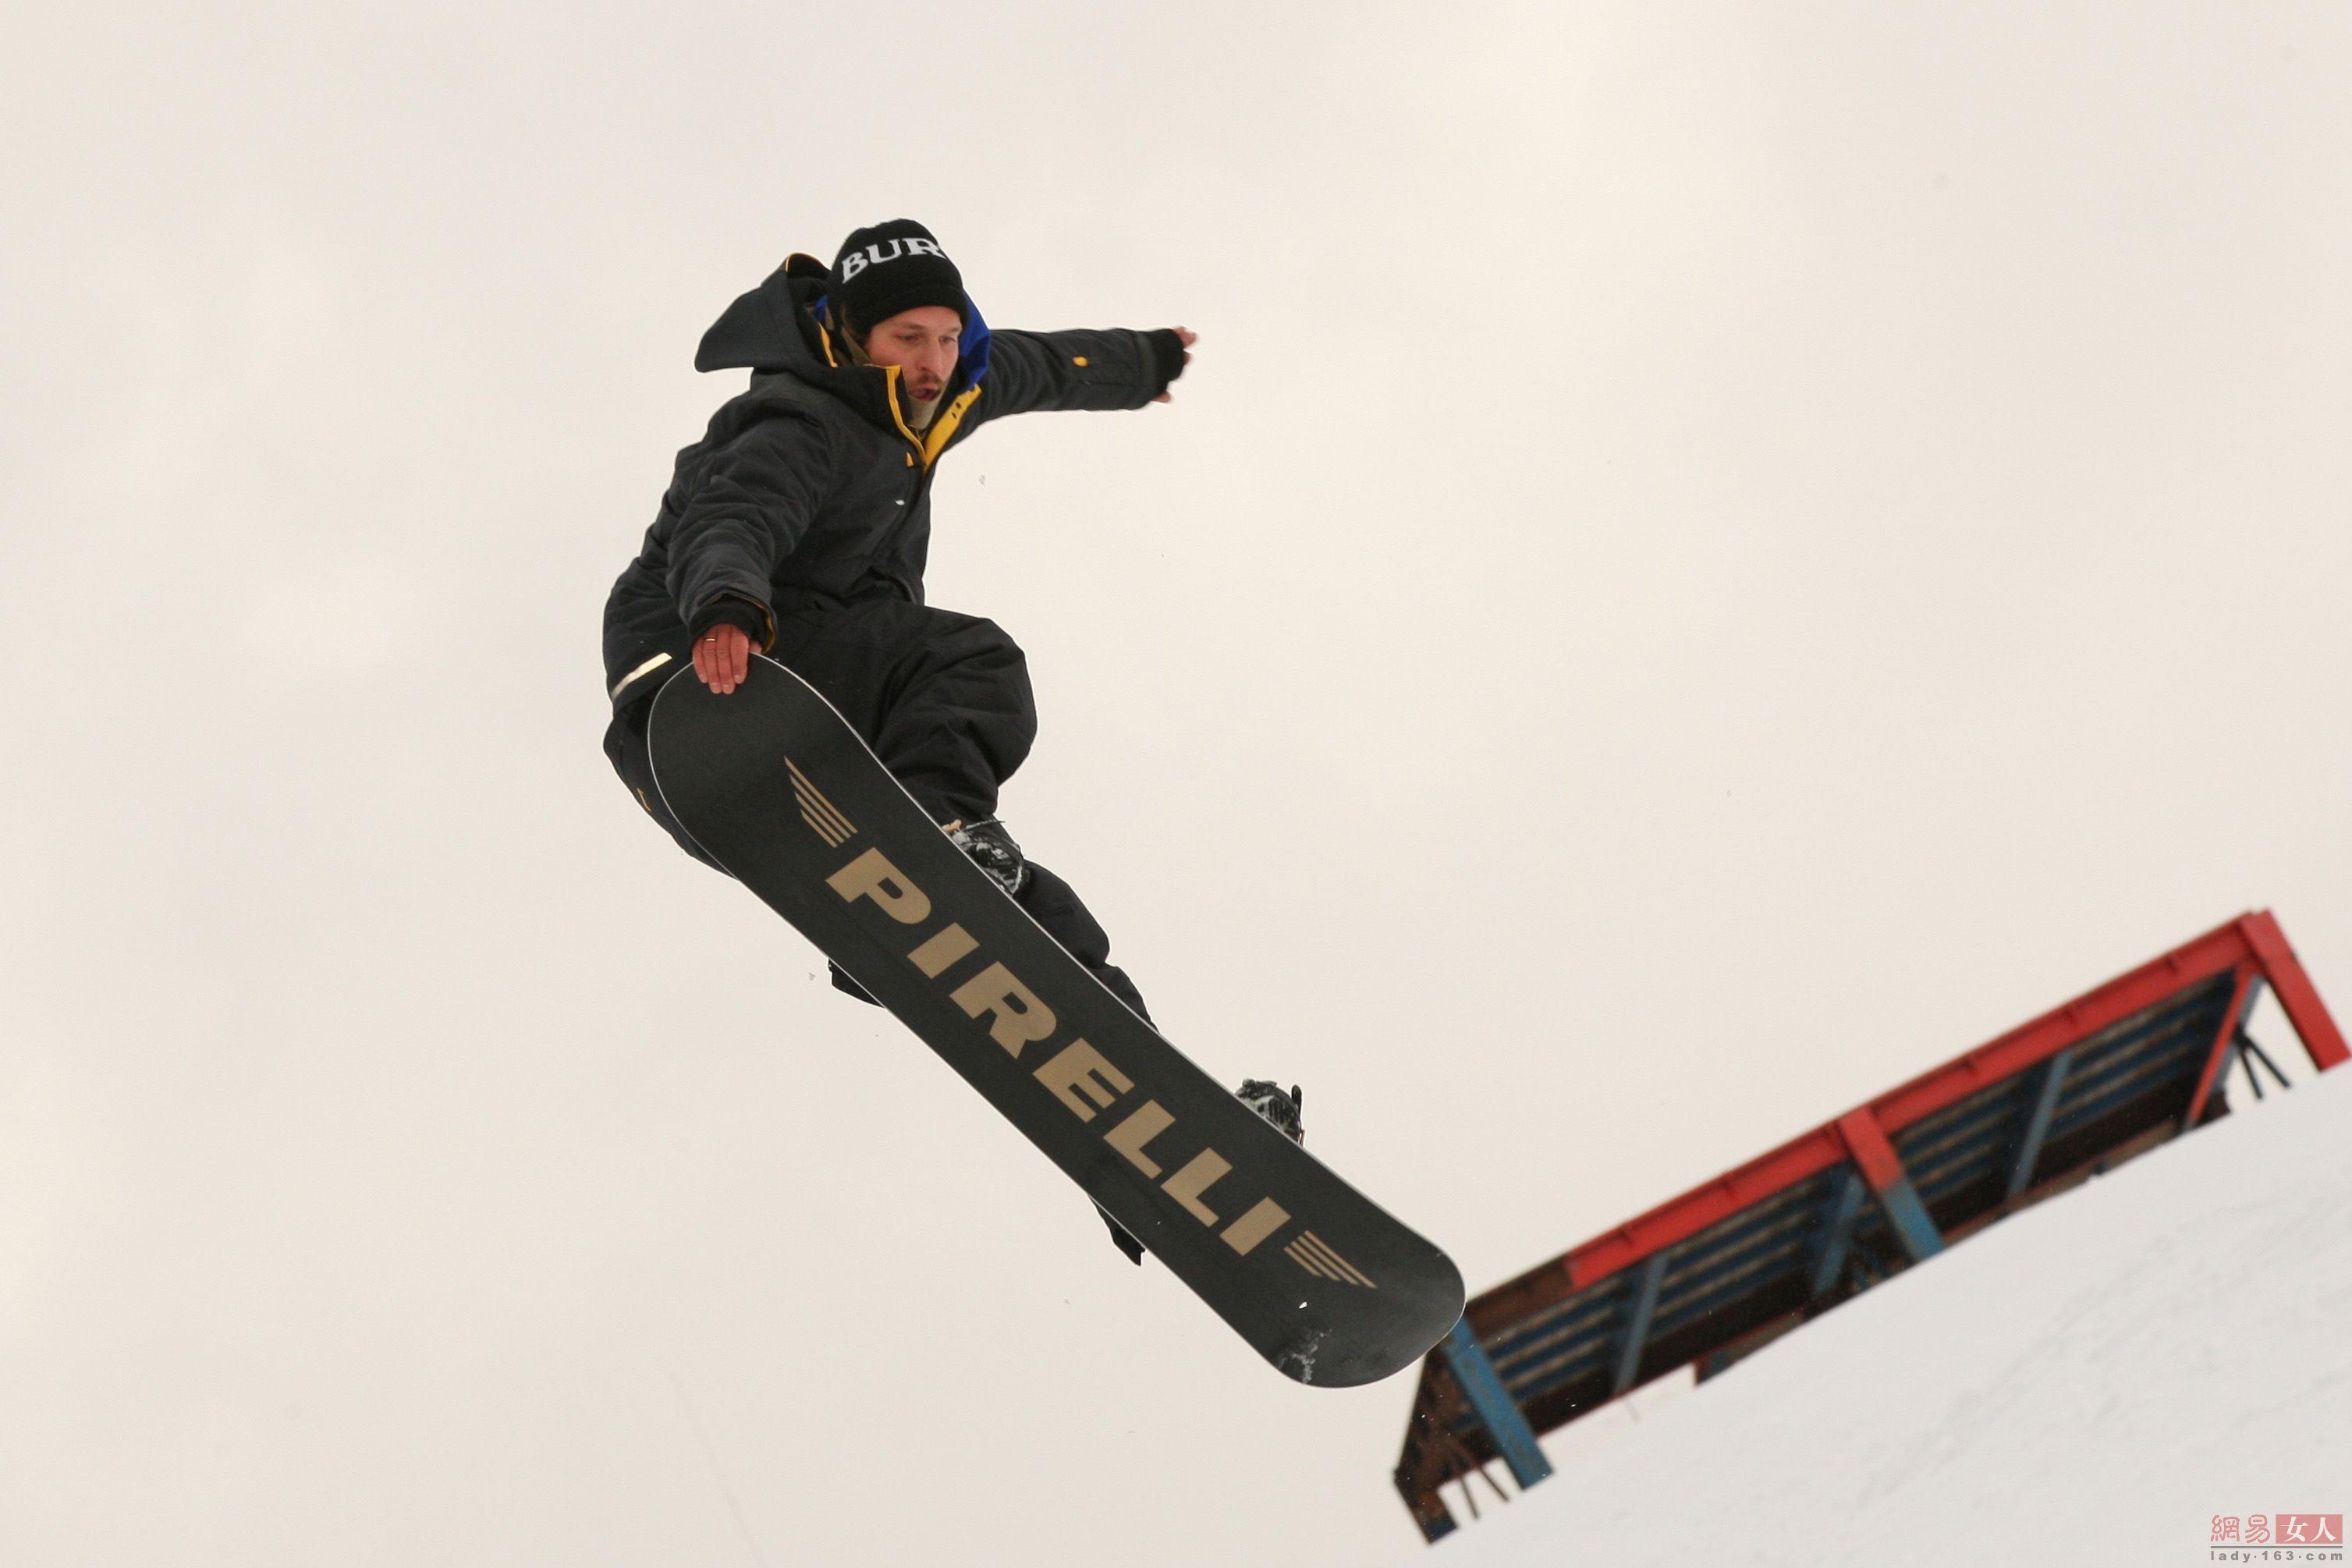 Pirelli Strikes Hockey and Skiing Sponsorship Deals